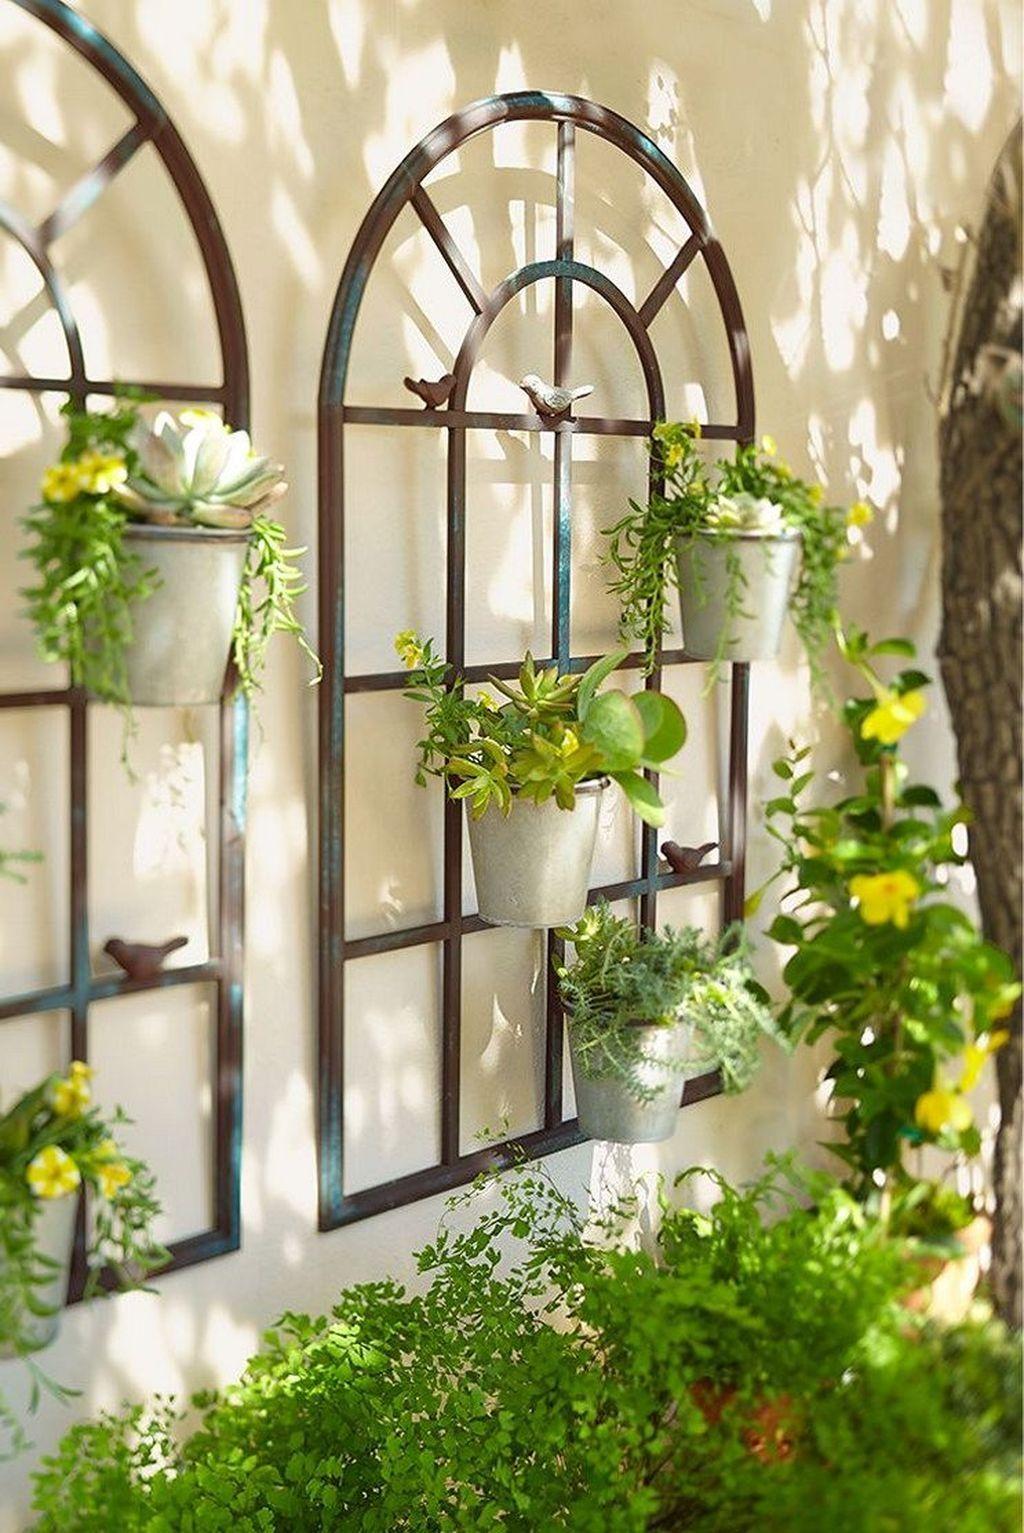 20 amazing wall outdoor design ideas patio wall decor on large wall art id=15060